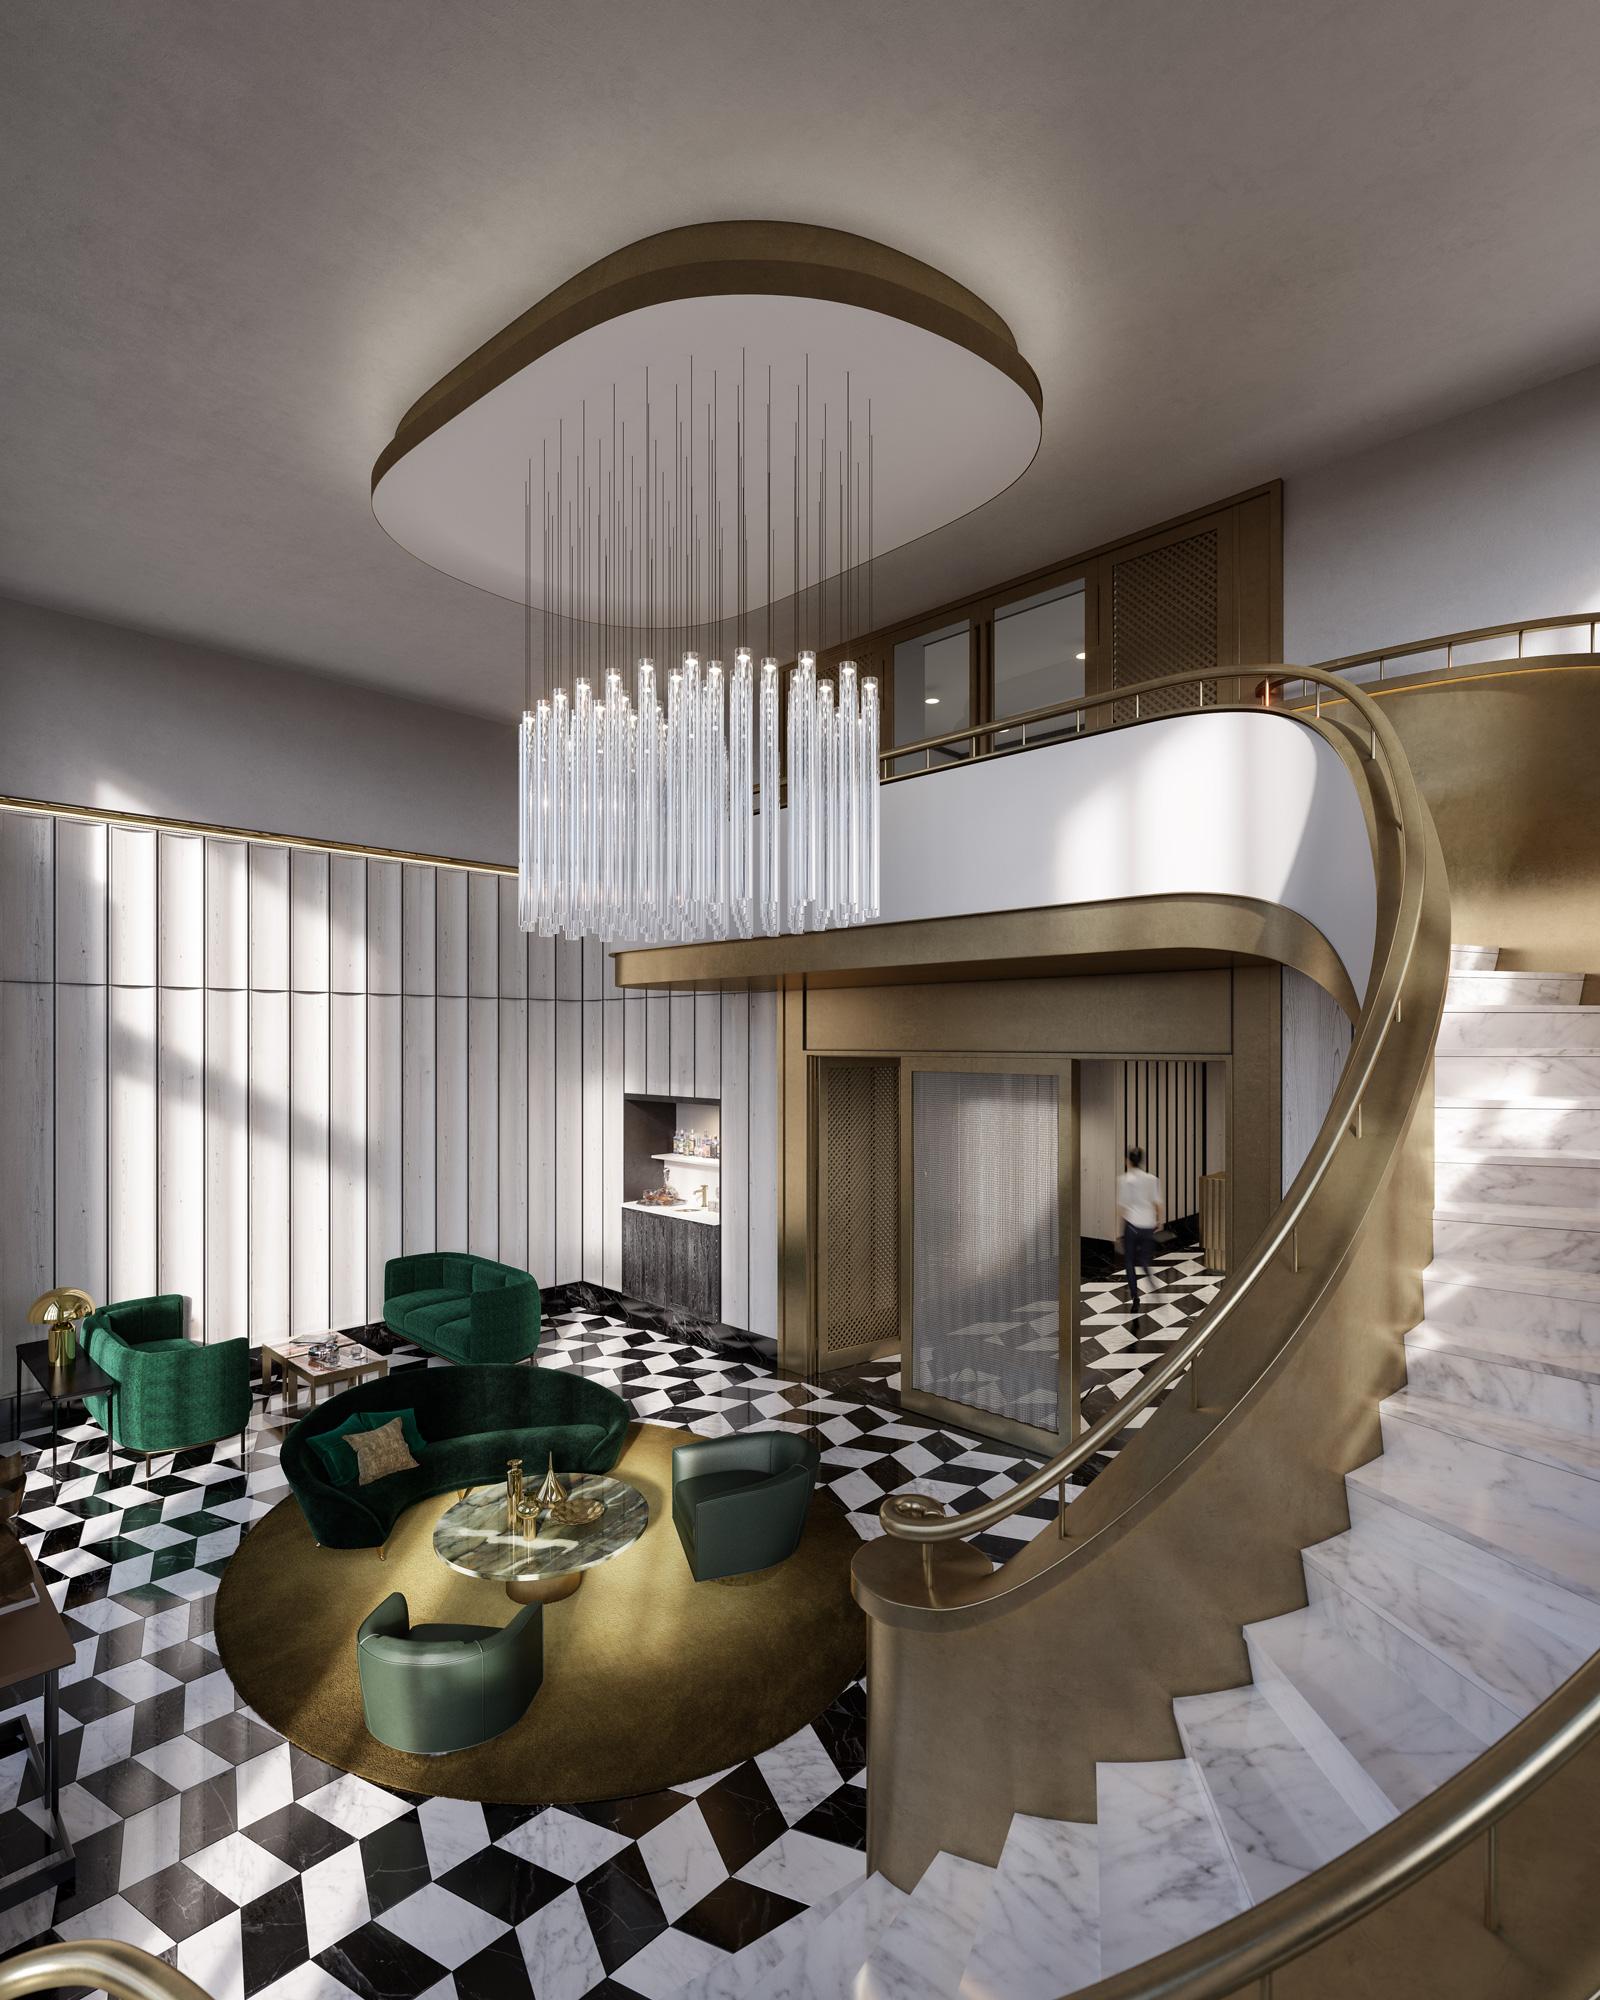 Condos New York City: Upper East Side New Condominiums